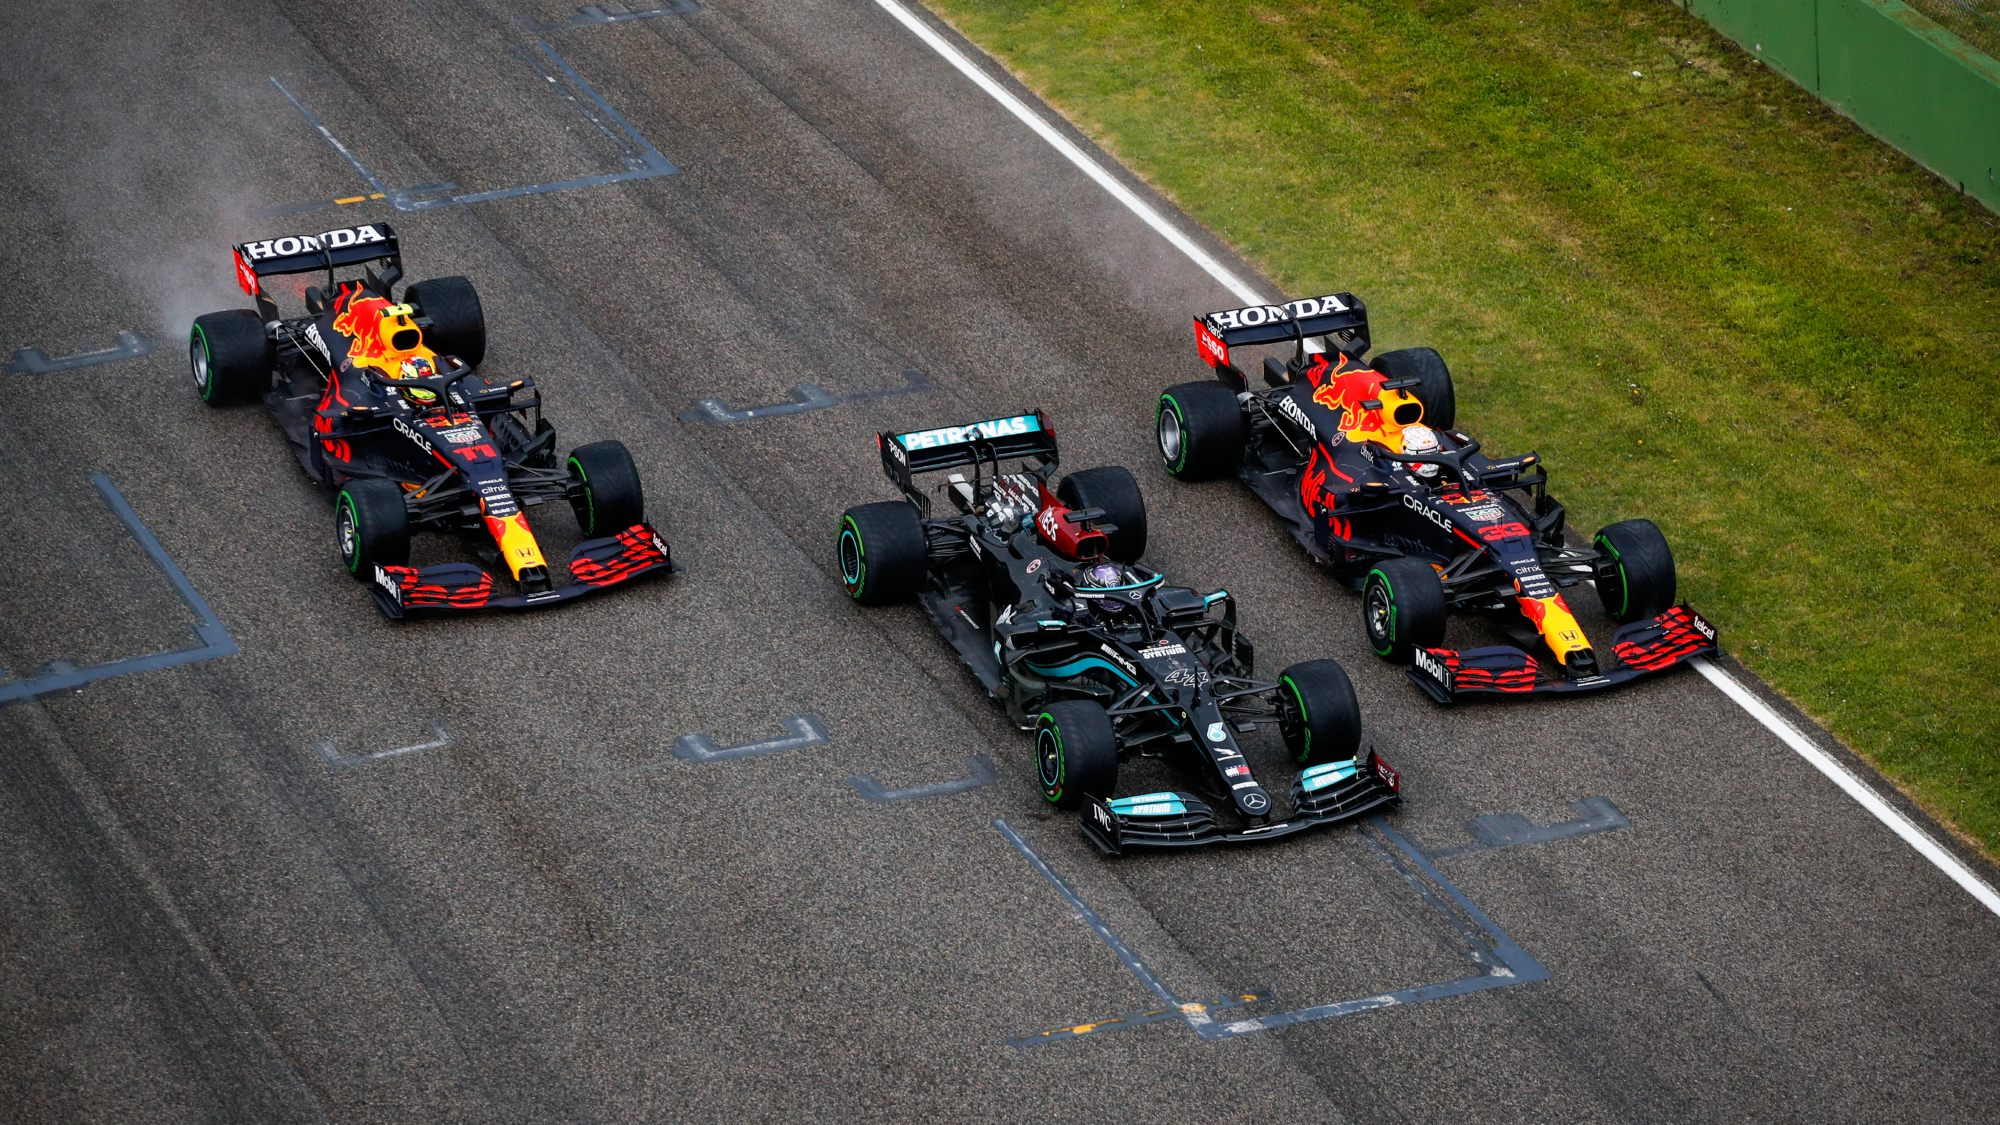 2021 Emilia Romagna GP race start